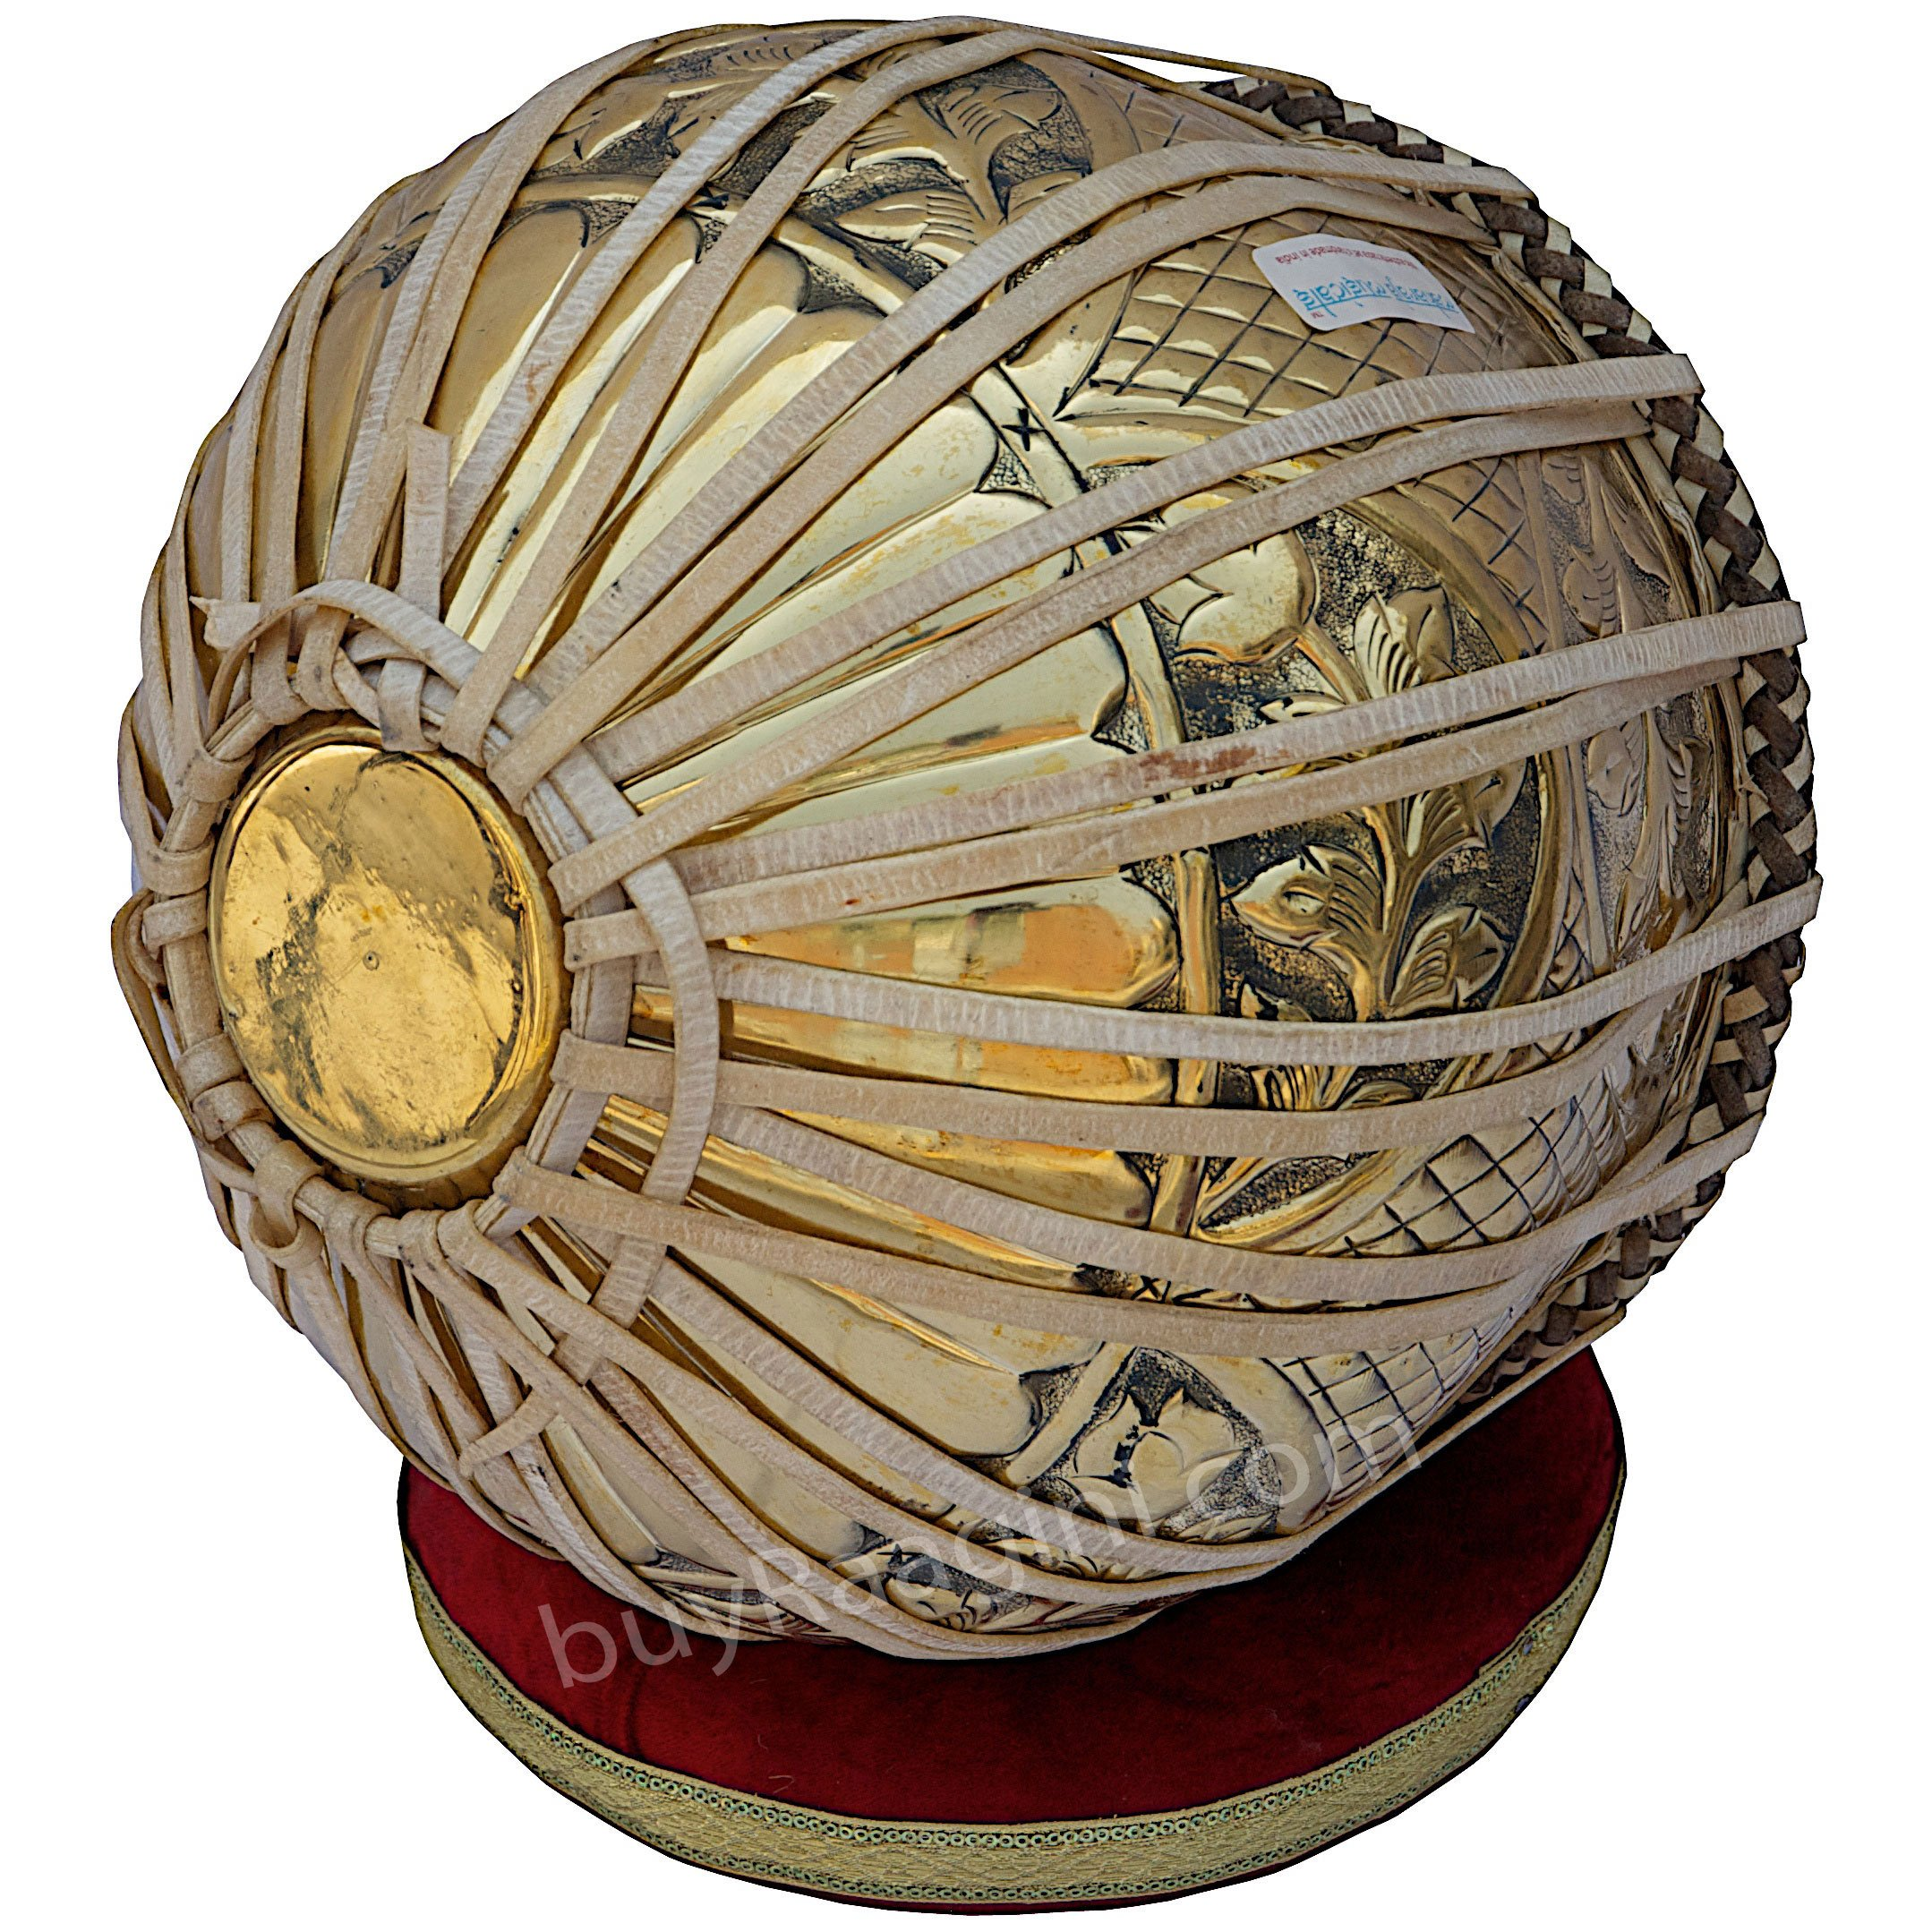 Tabla Set, Maharaja Musicals, 3.5 Kg Designer Golden Brass Bayan, Sheesham Tabla Dayan, Professional Drums, Padded Bag, Book, Hammer, Cushions, Cover, Tabla Drums Indian (PDI-FG) by Maharaja Musicals (Image #5)